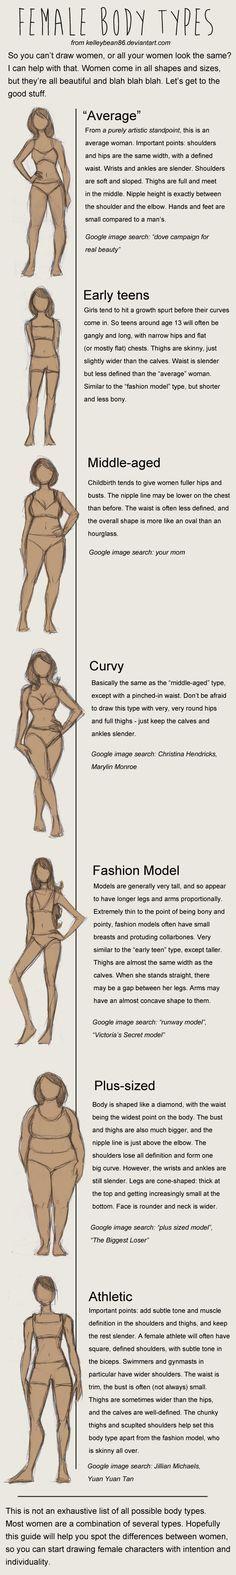 Draw Female Body Types by ~kelleybean86 on deviantART